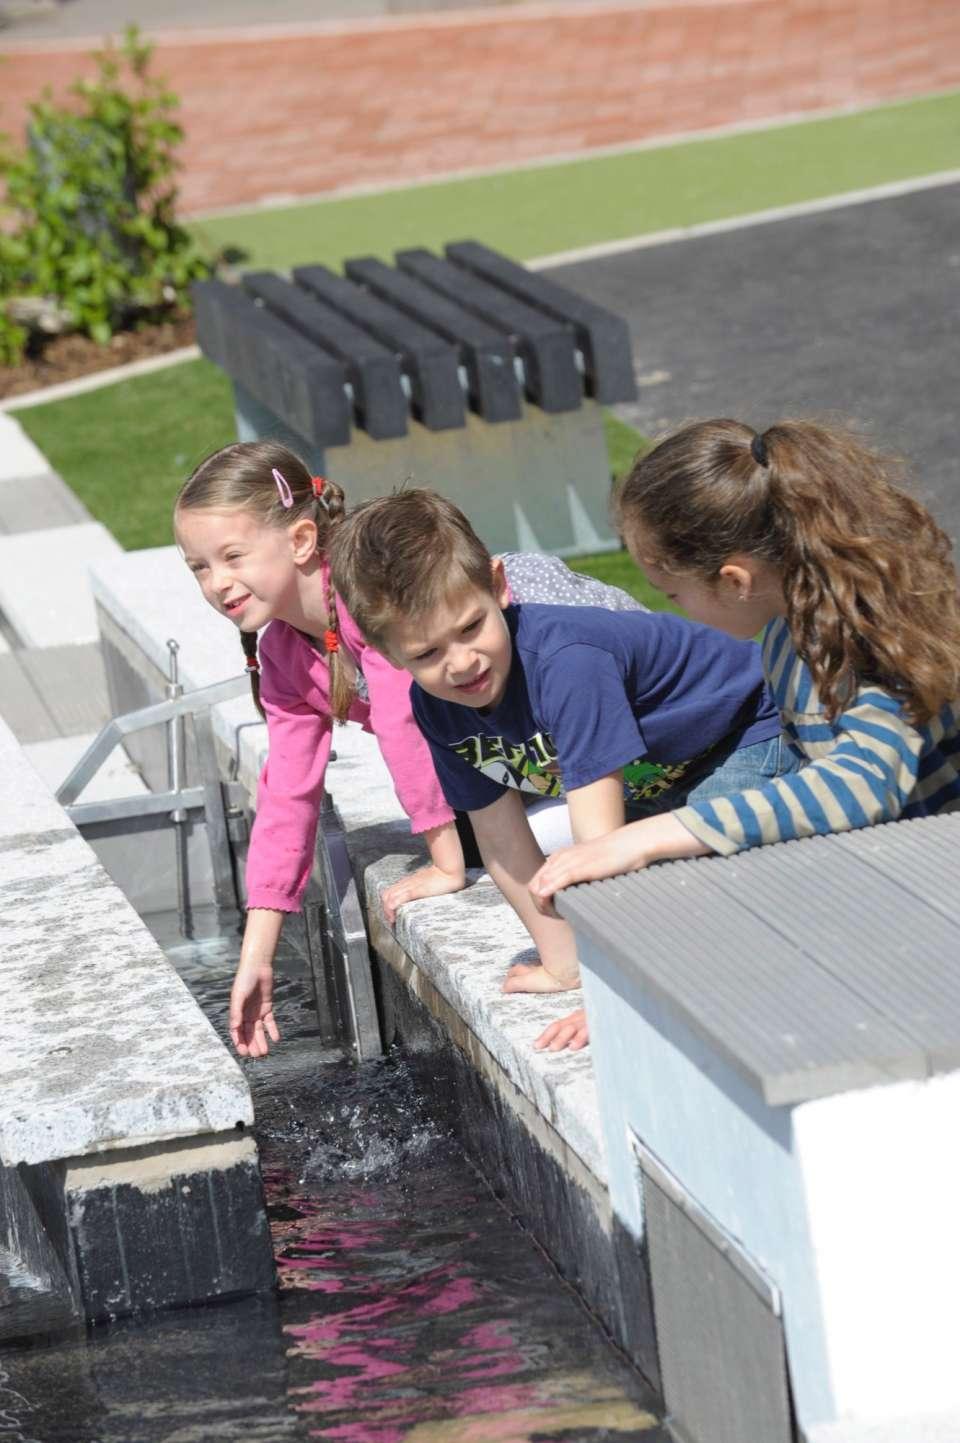 Thinktank Science Garden designed by Gillespies opens in Birmingham